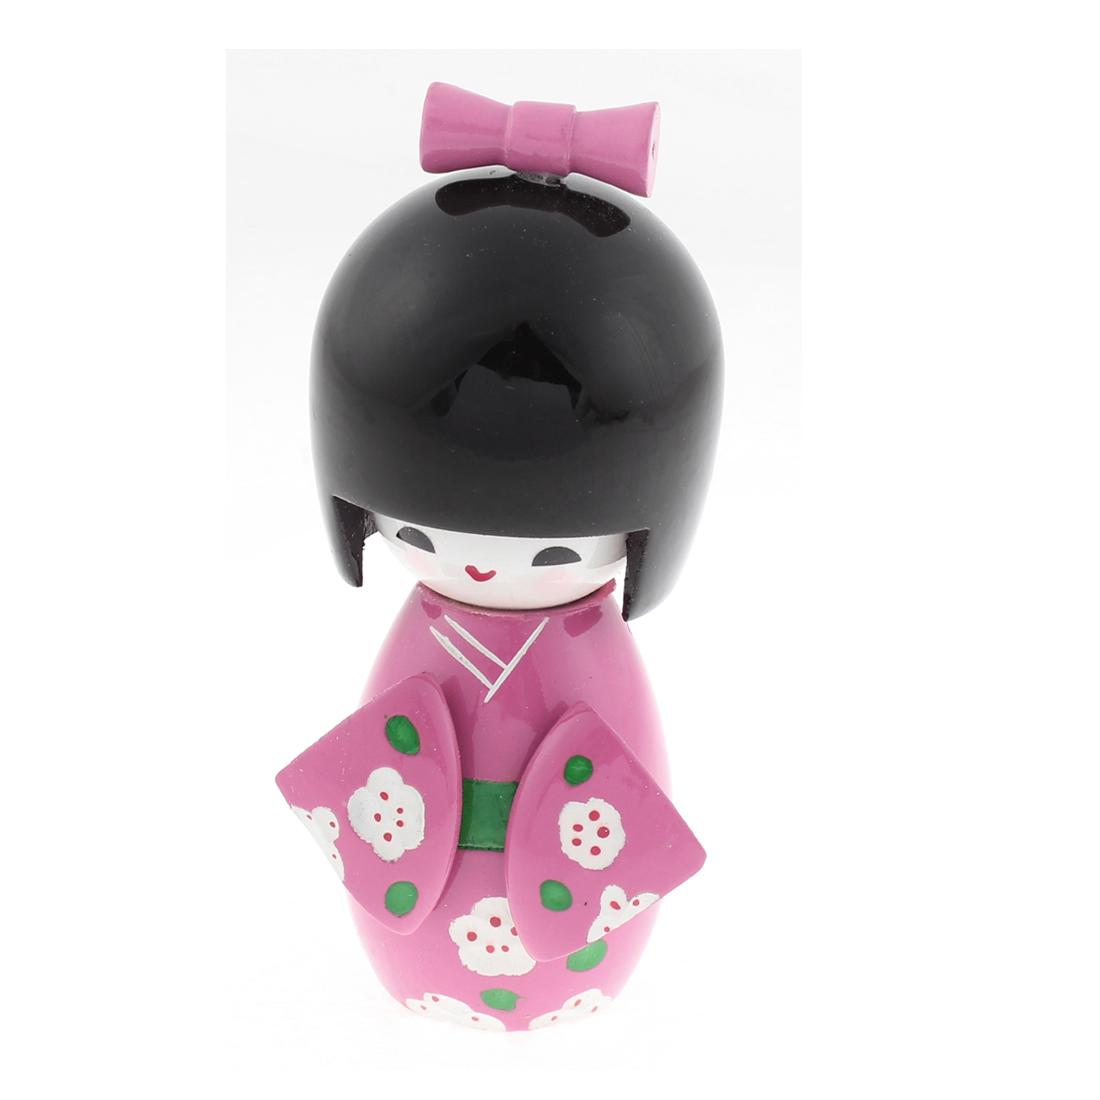 Handmade Japanese Kokeshi Wooden Girl Doll 11cm Height DIY Craft